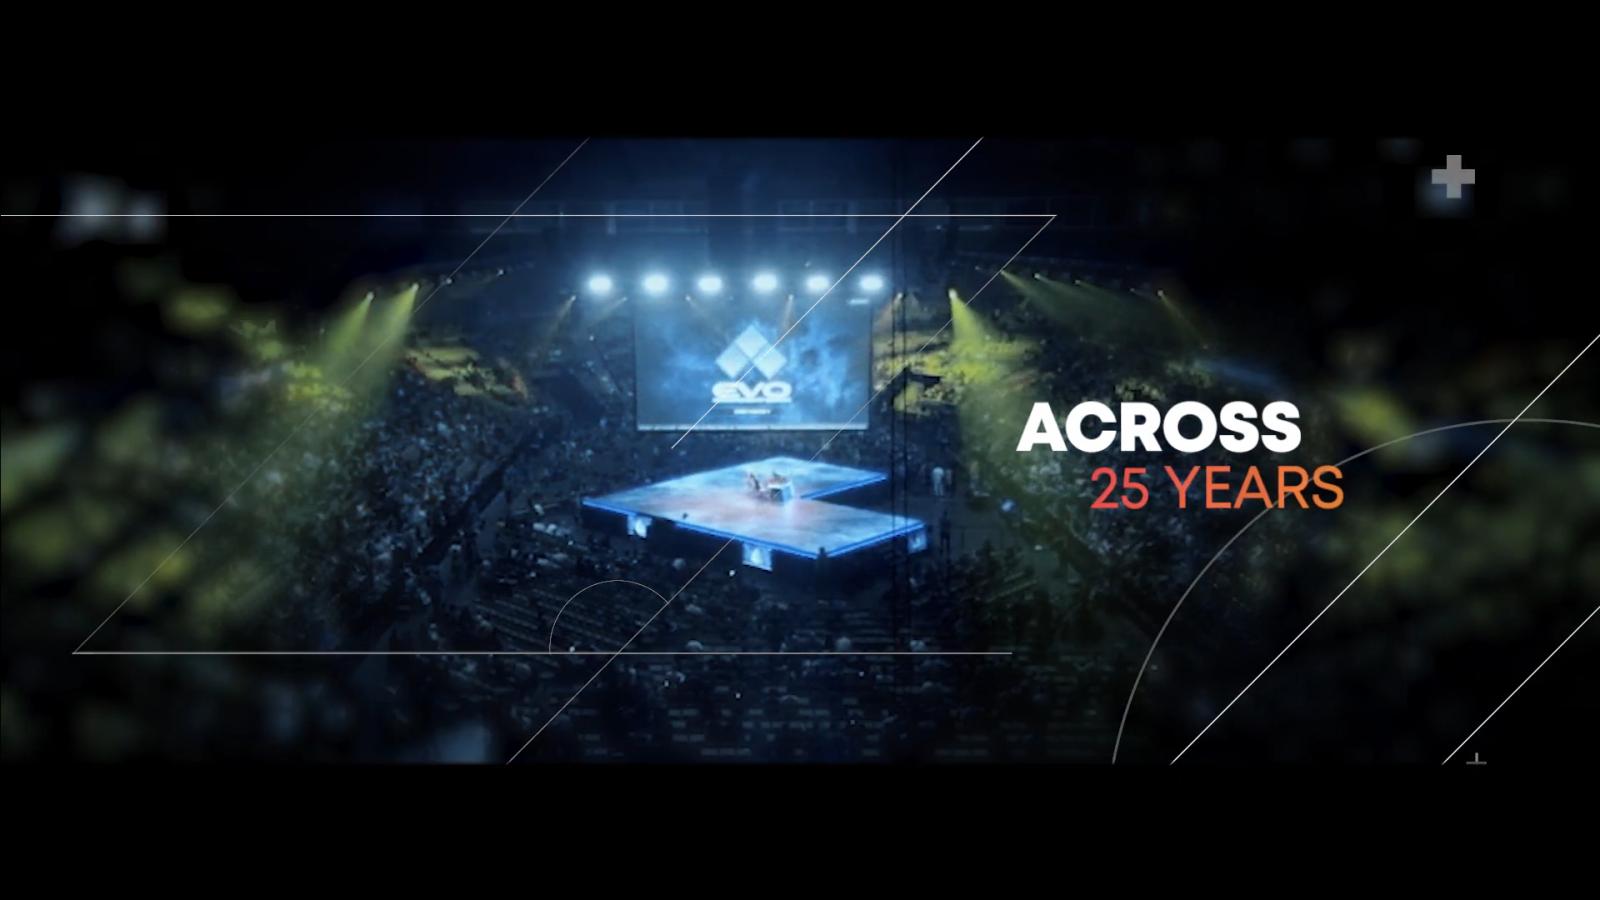 EVO宣布2022年回归线下丨格斗游戏资讯一周回顾